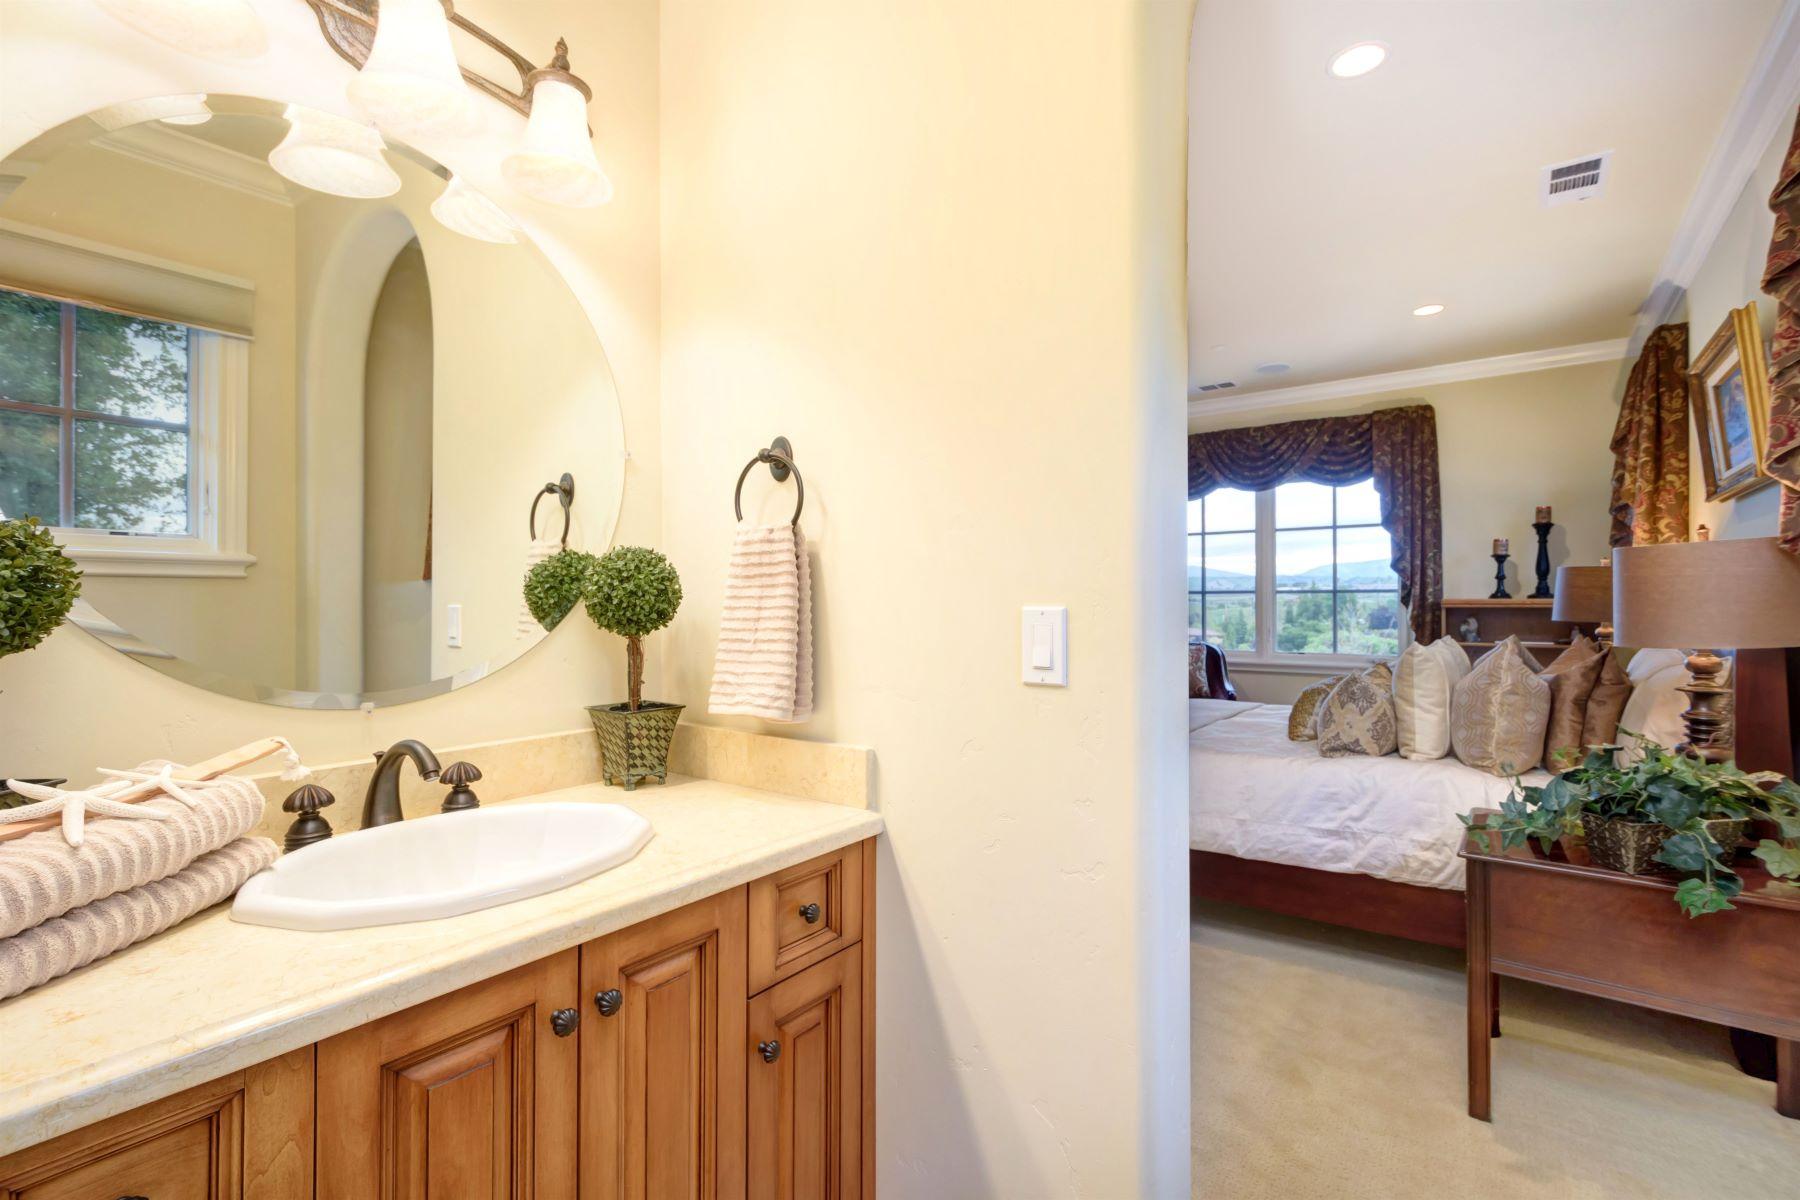 Additional photo for property listing at 1833 Via Di Salerno  Pleasanton, California 94566 United States